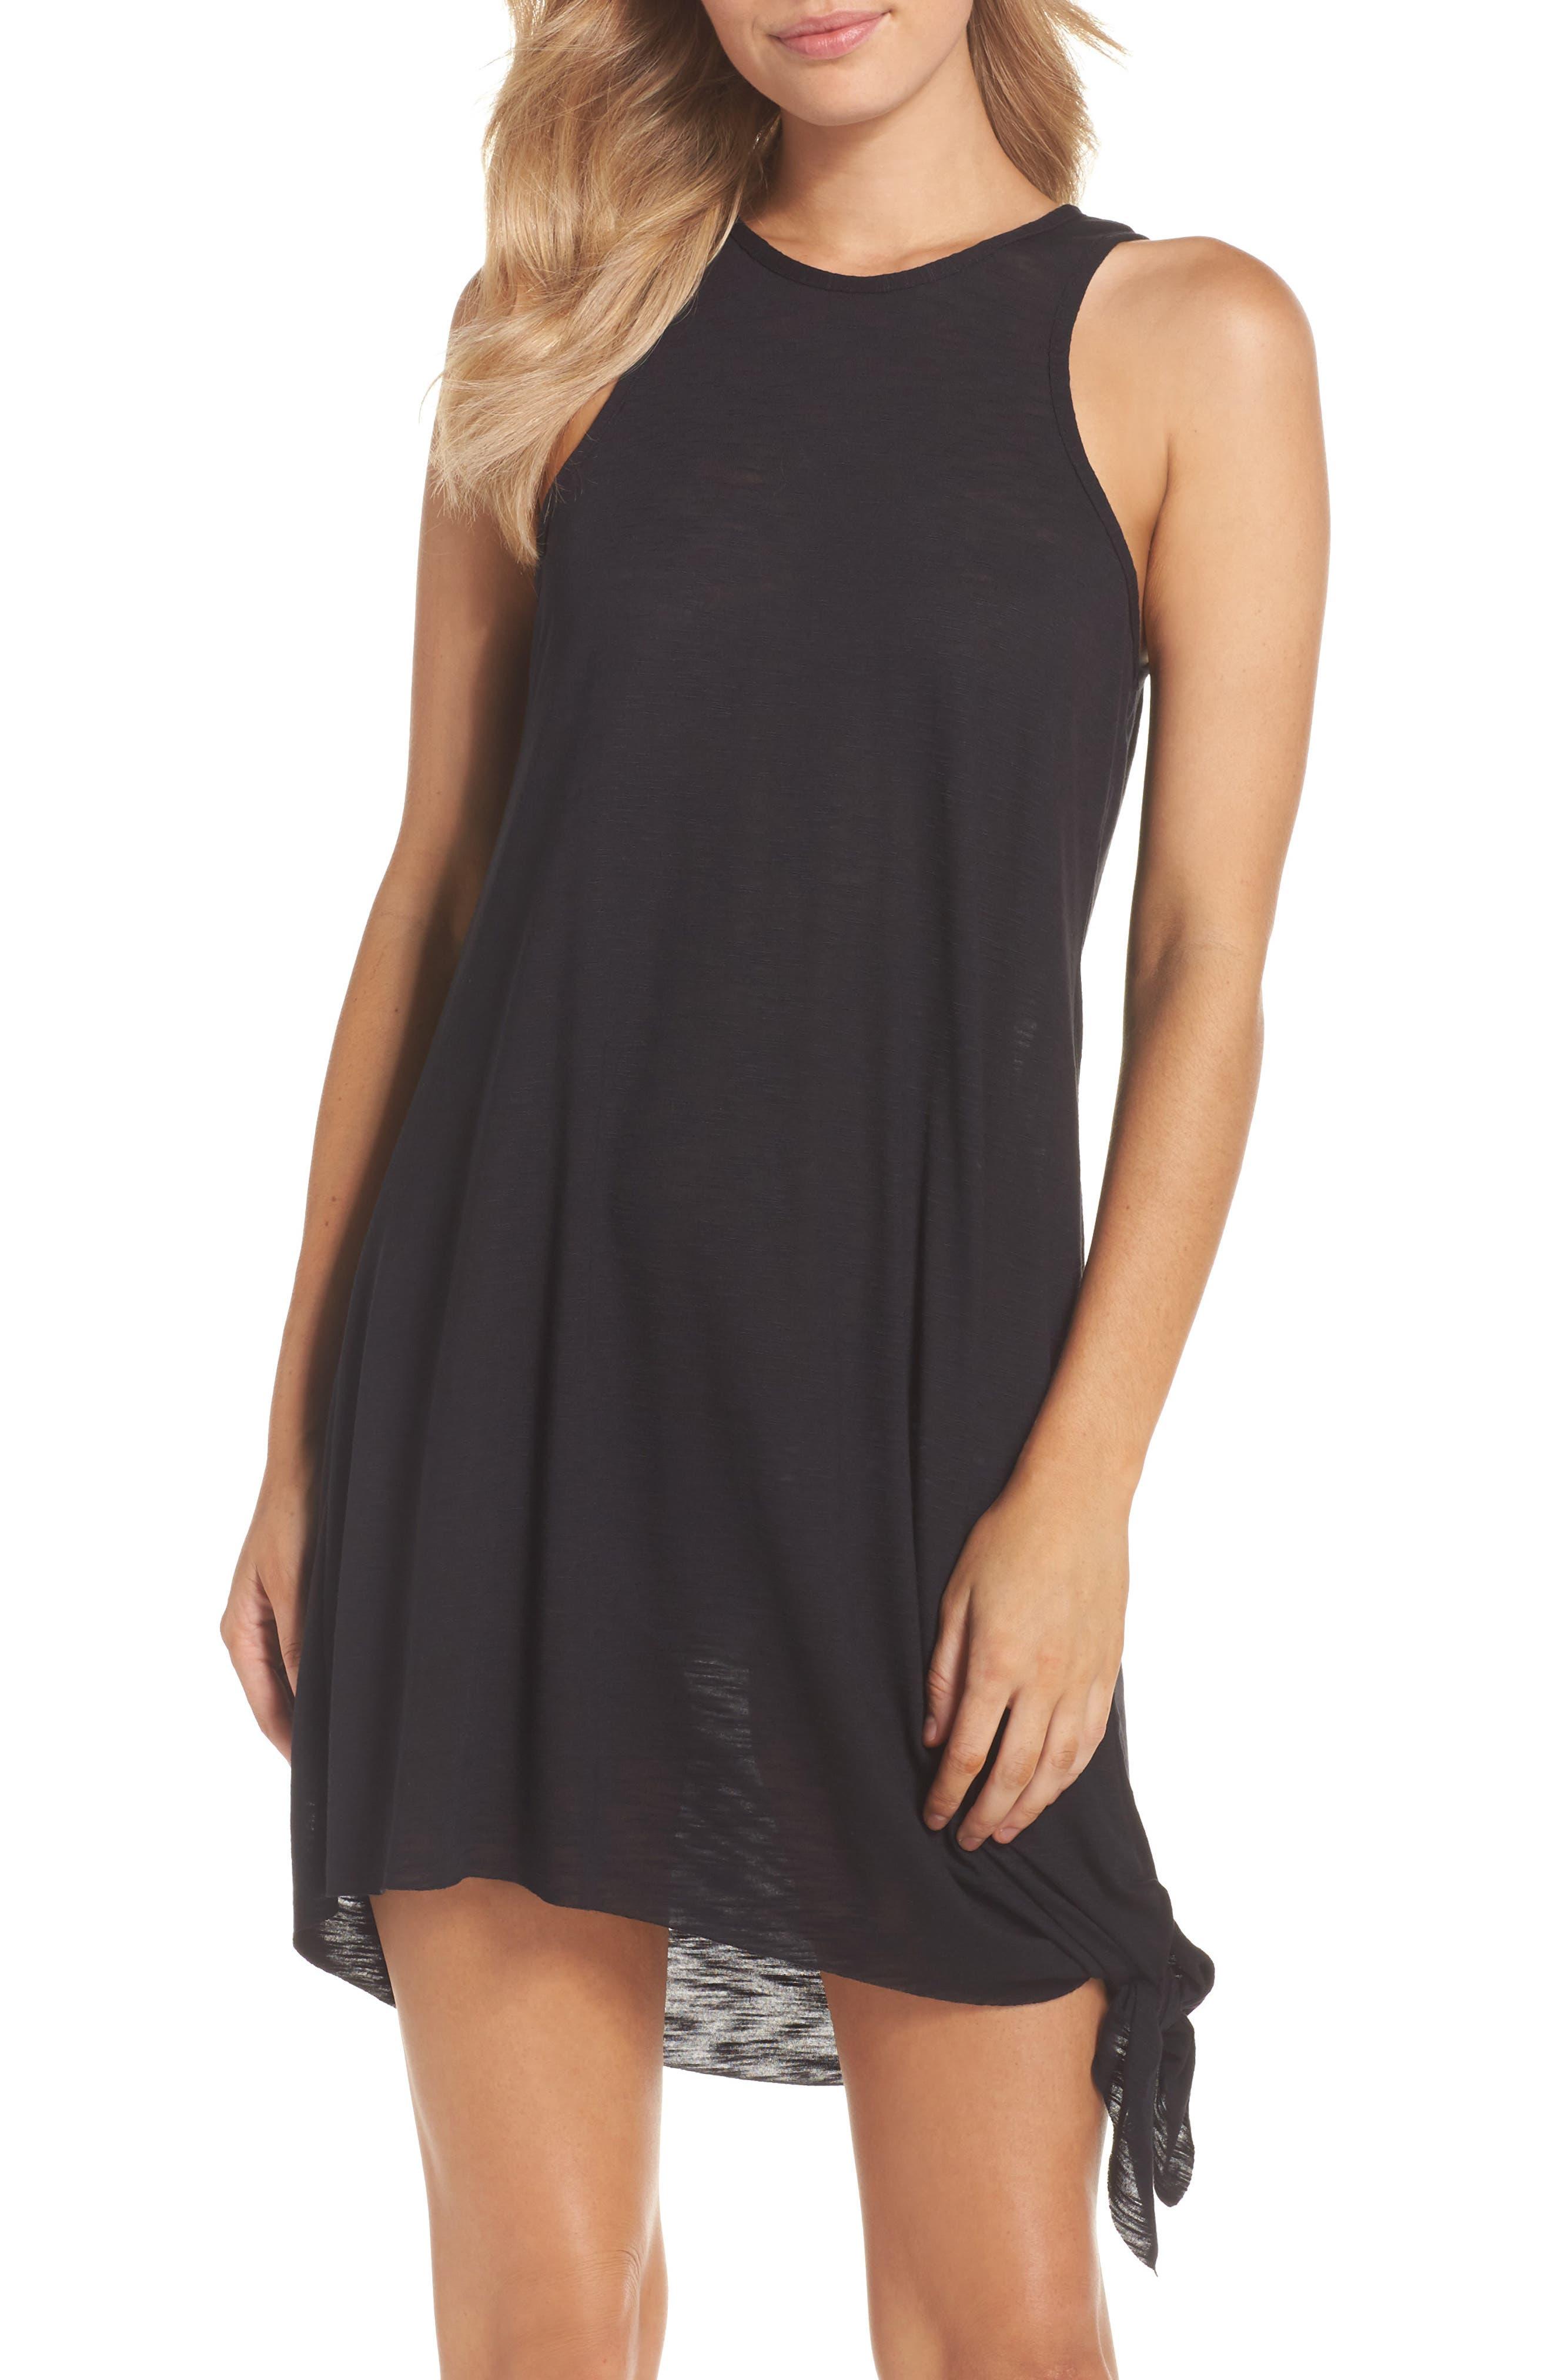 Breezy Basics Cover-Up Dress,                             Main thumbnail 1, color,                             BLACK